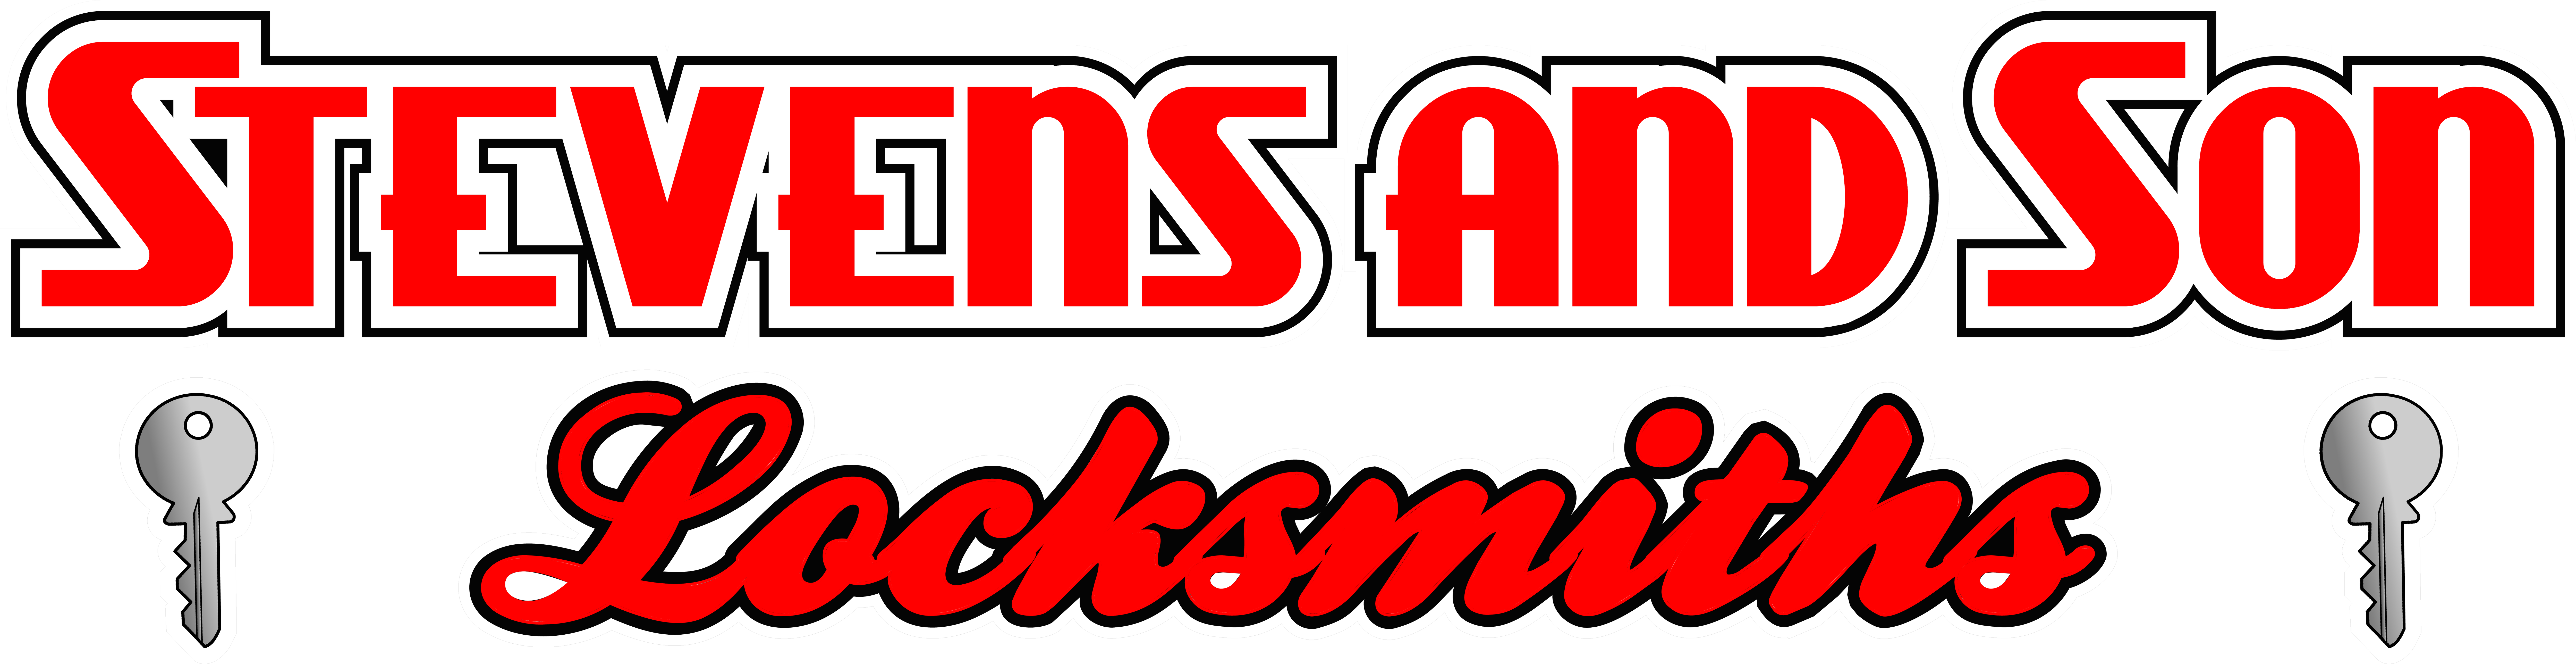 Stevens & Sons Locksmith